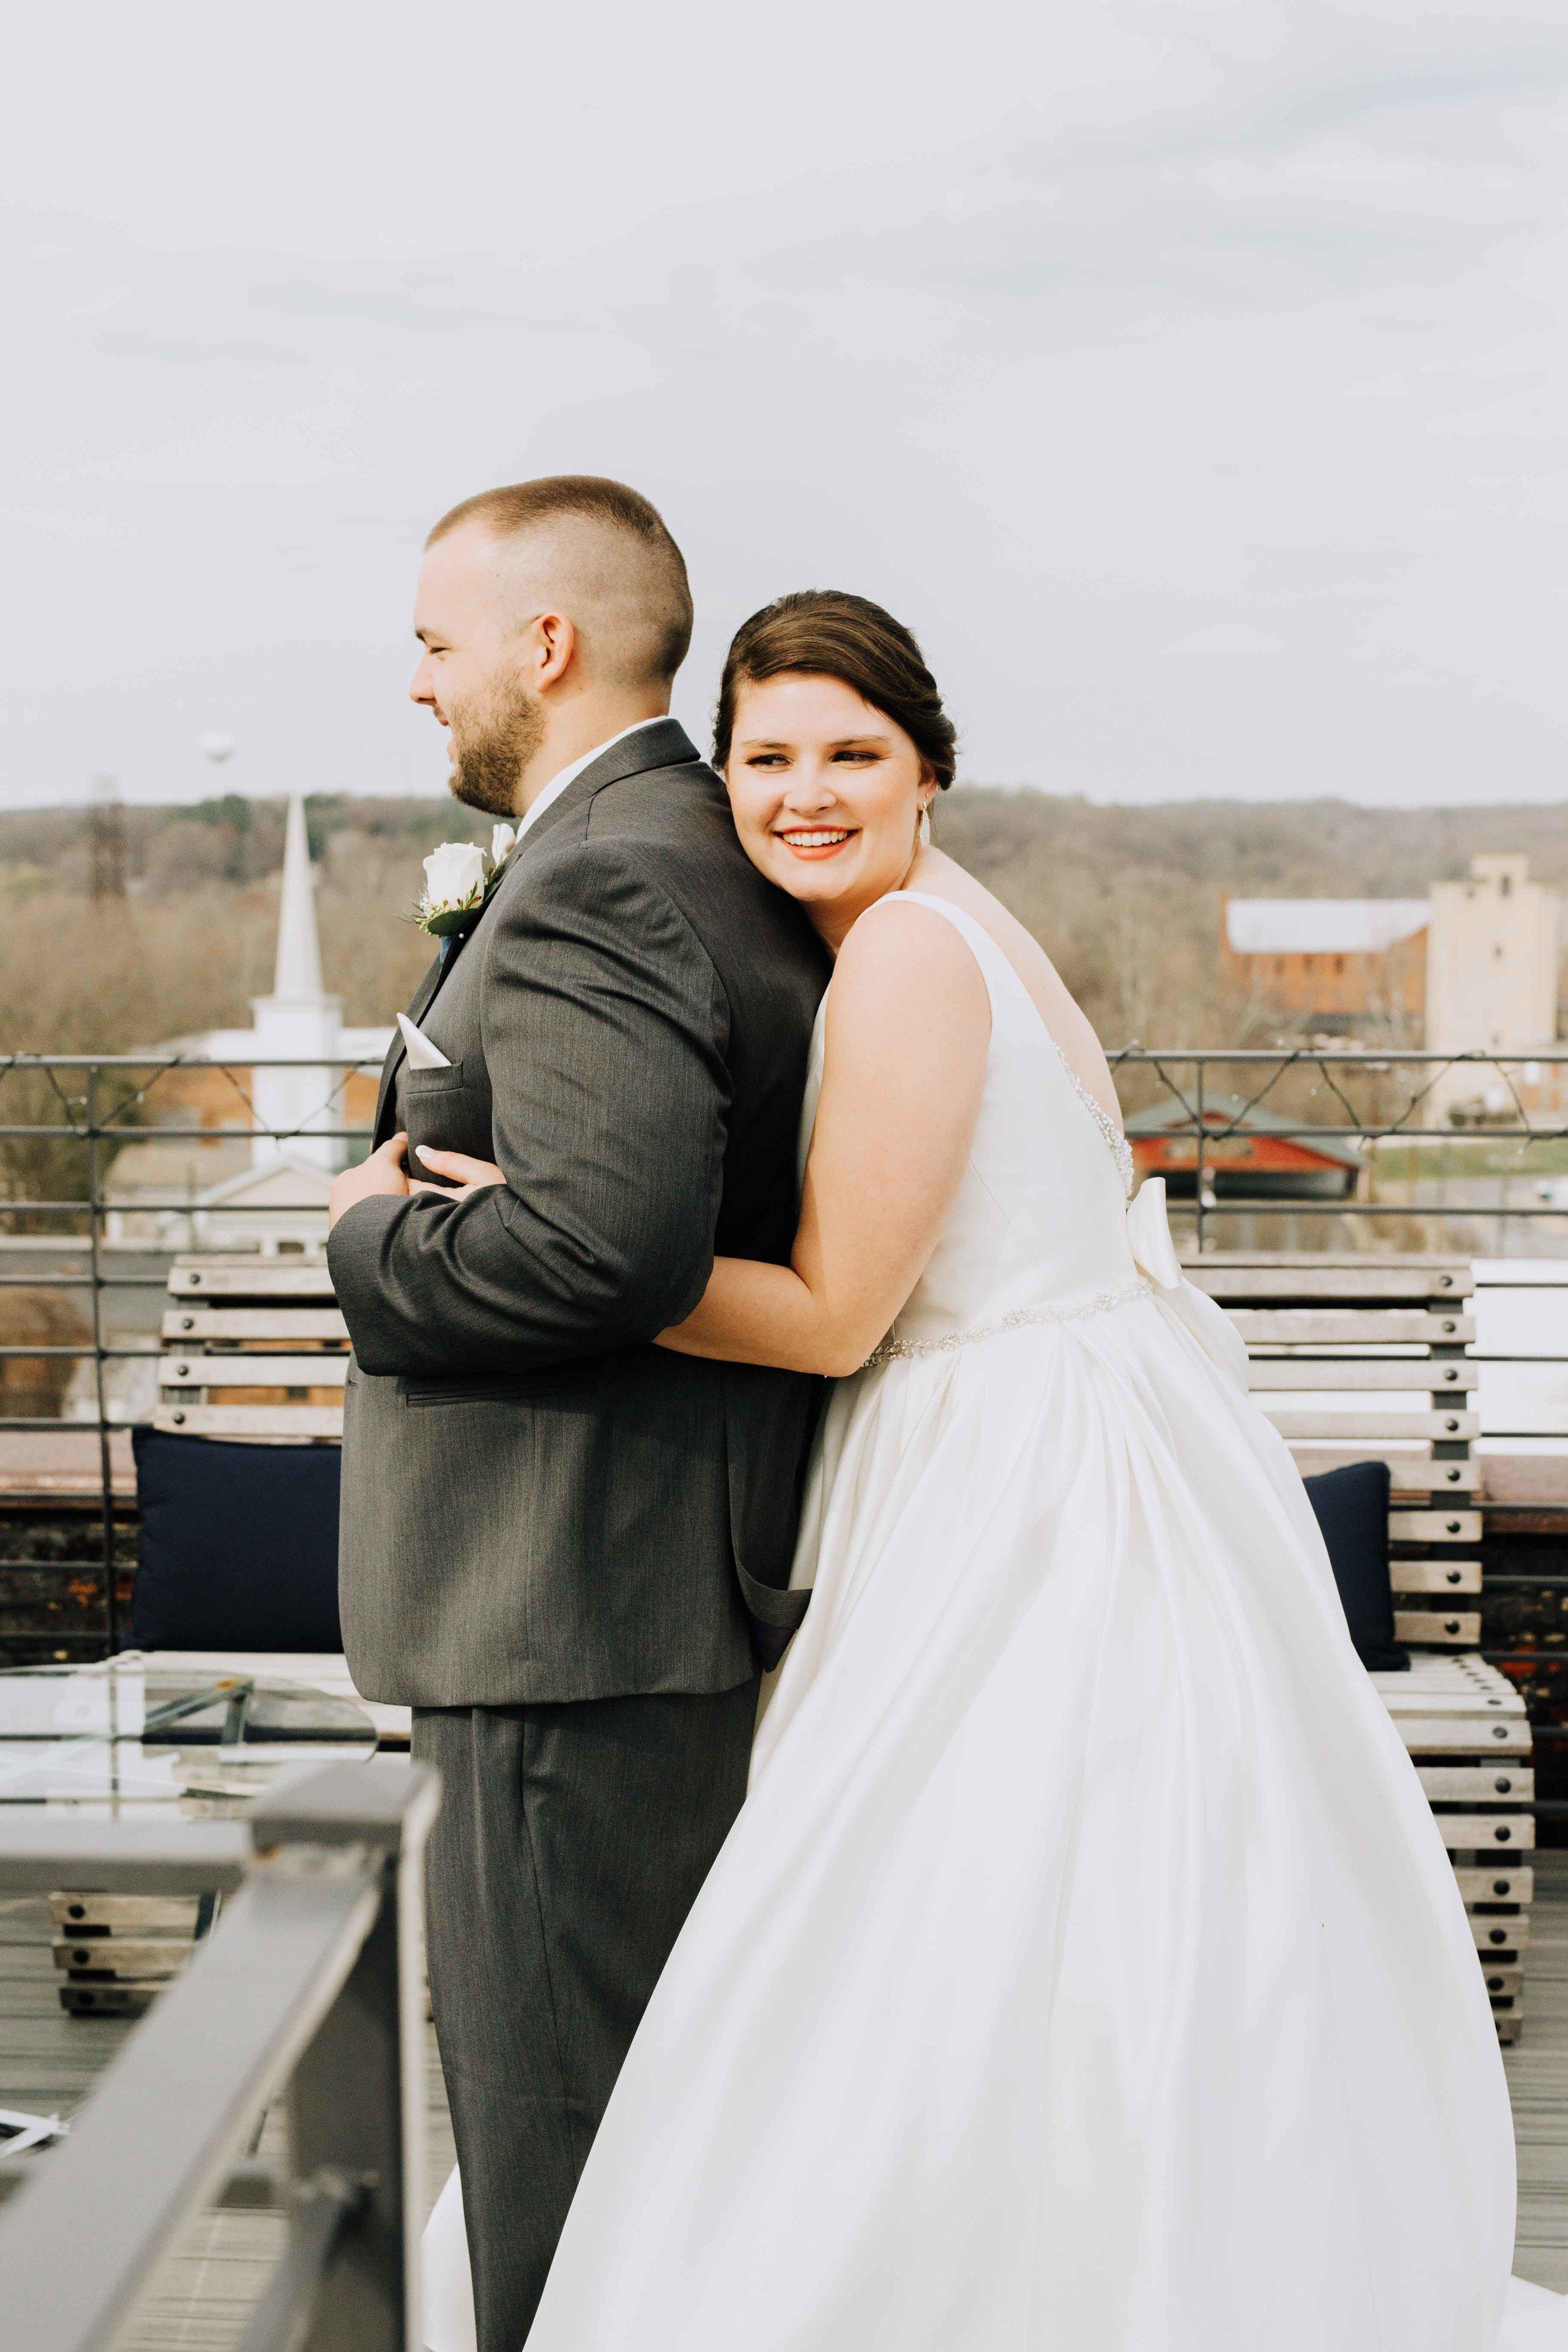 Farmville-Virginia-Wedding-Hotel-Weynoke-Downtown-Jacqueline-Waters-Photography-Detailed- (469).jpg